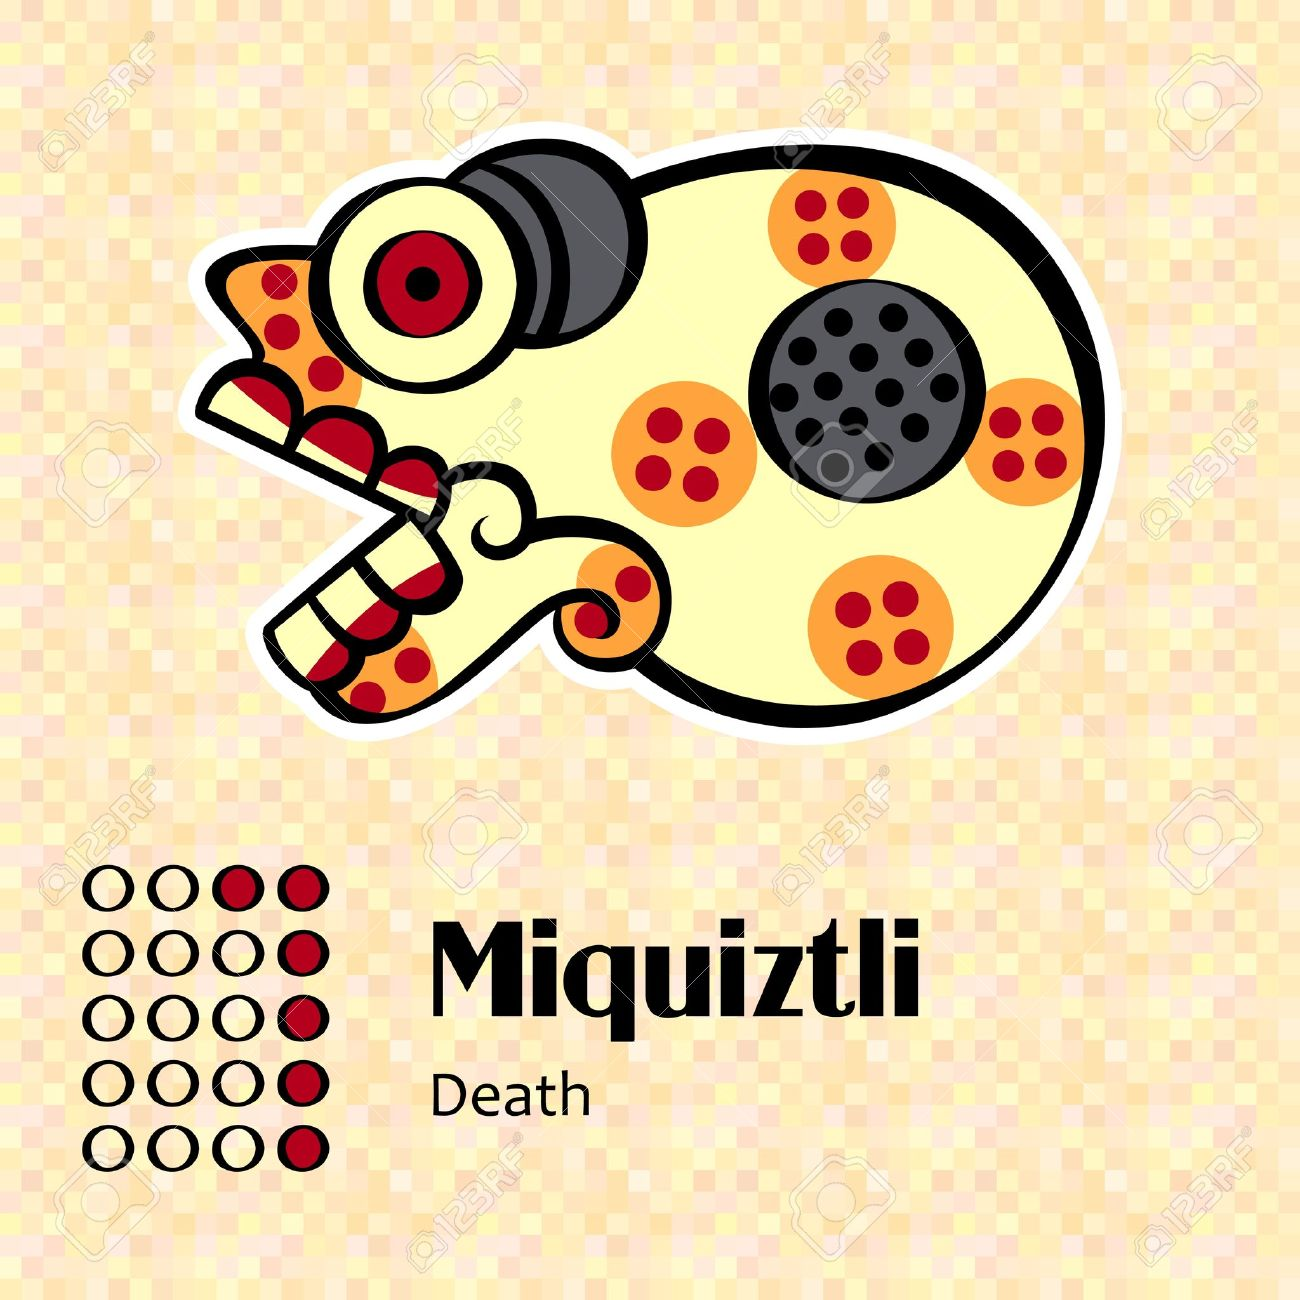 Calendario Inca Simbolos.Simbolos Aztecas Calendario Miquiztli O Muerte 6